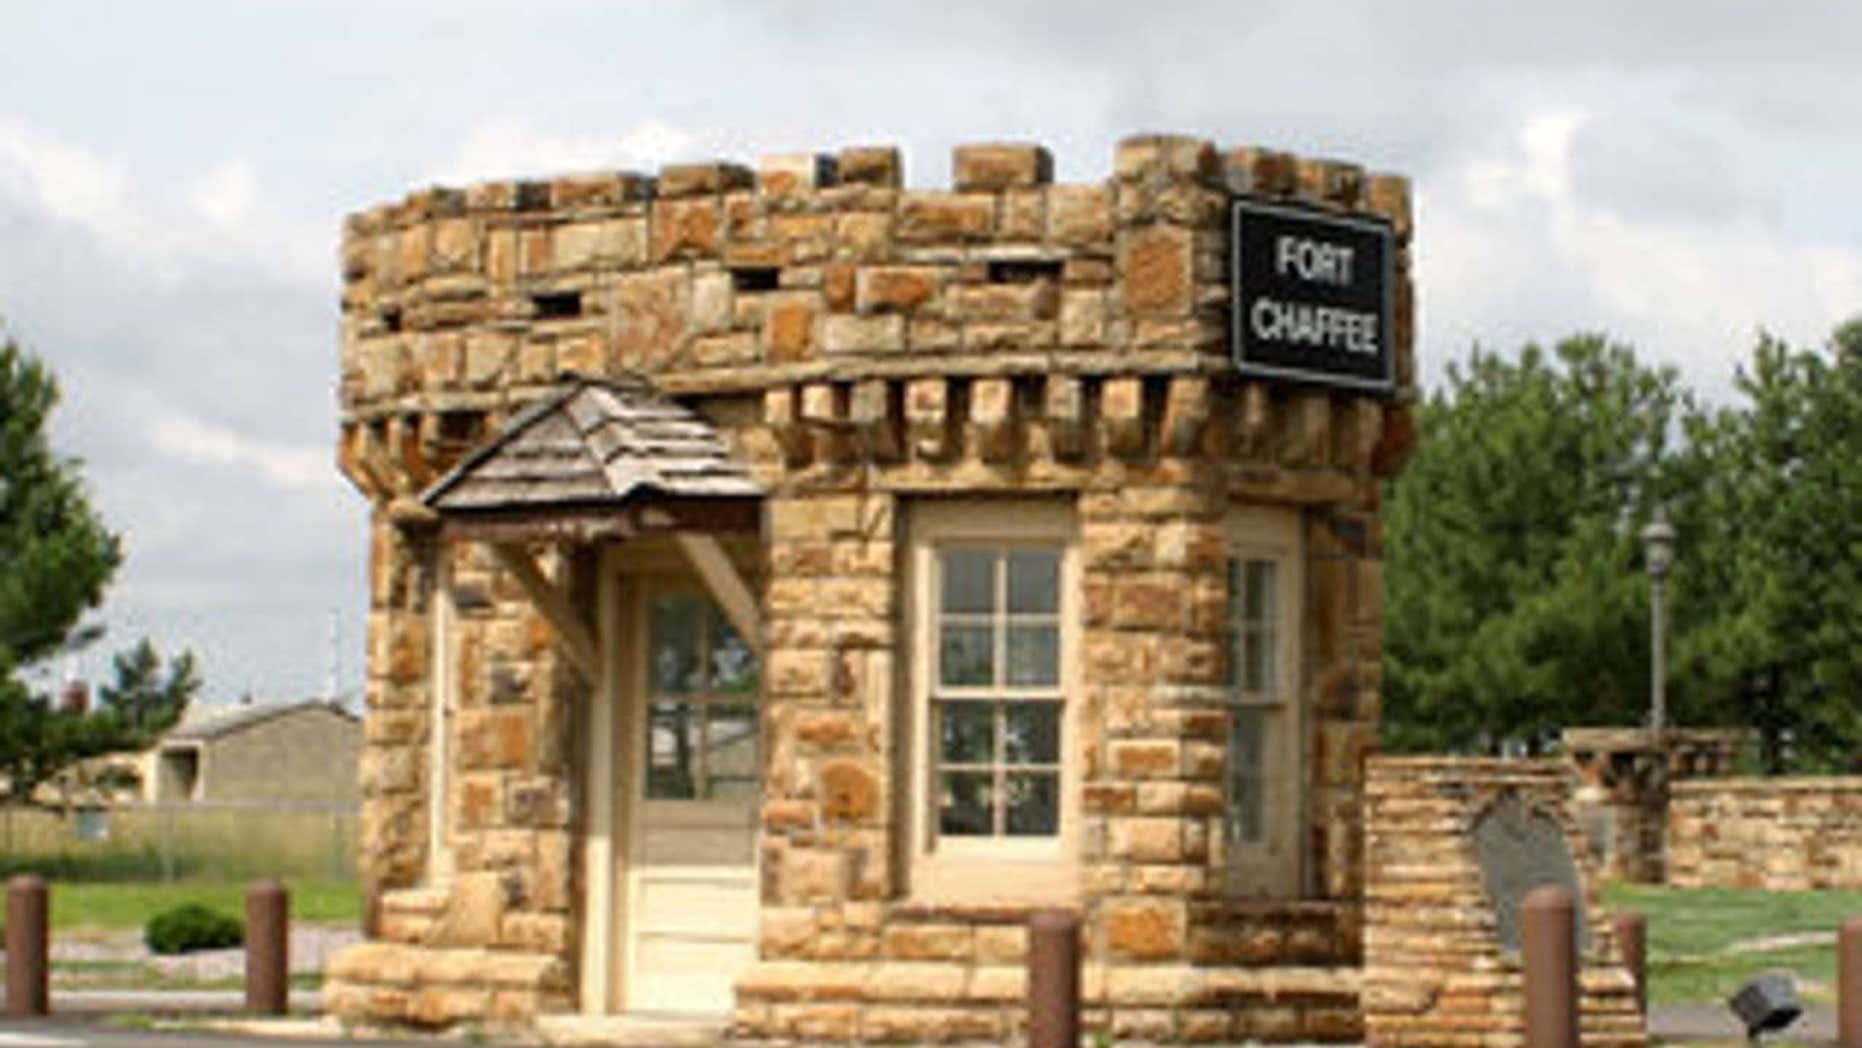 Fort Chaffee in Arkansas.